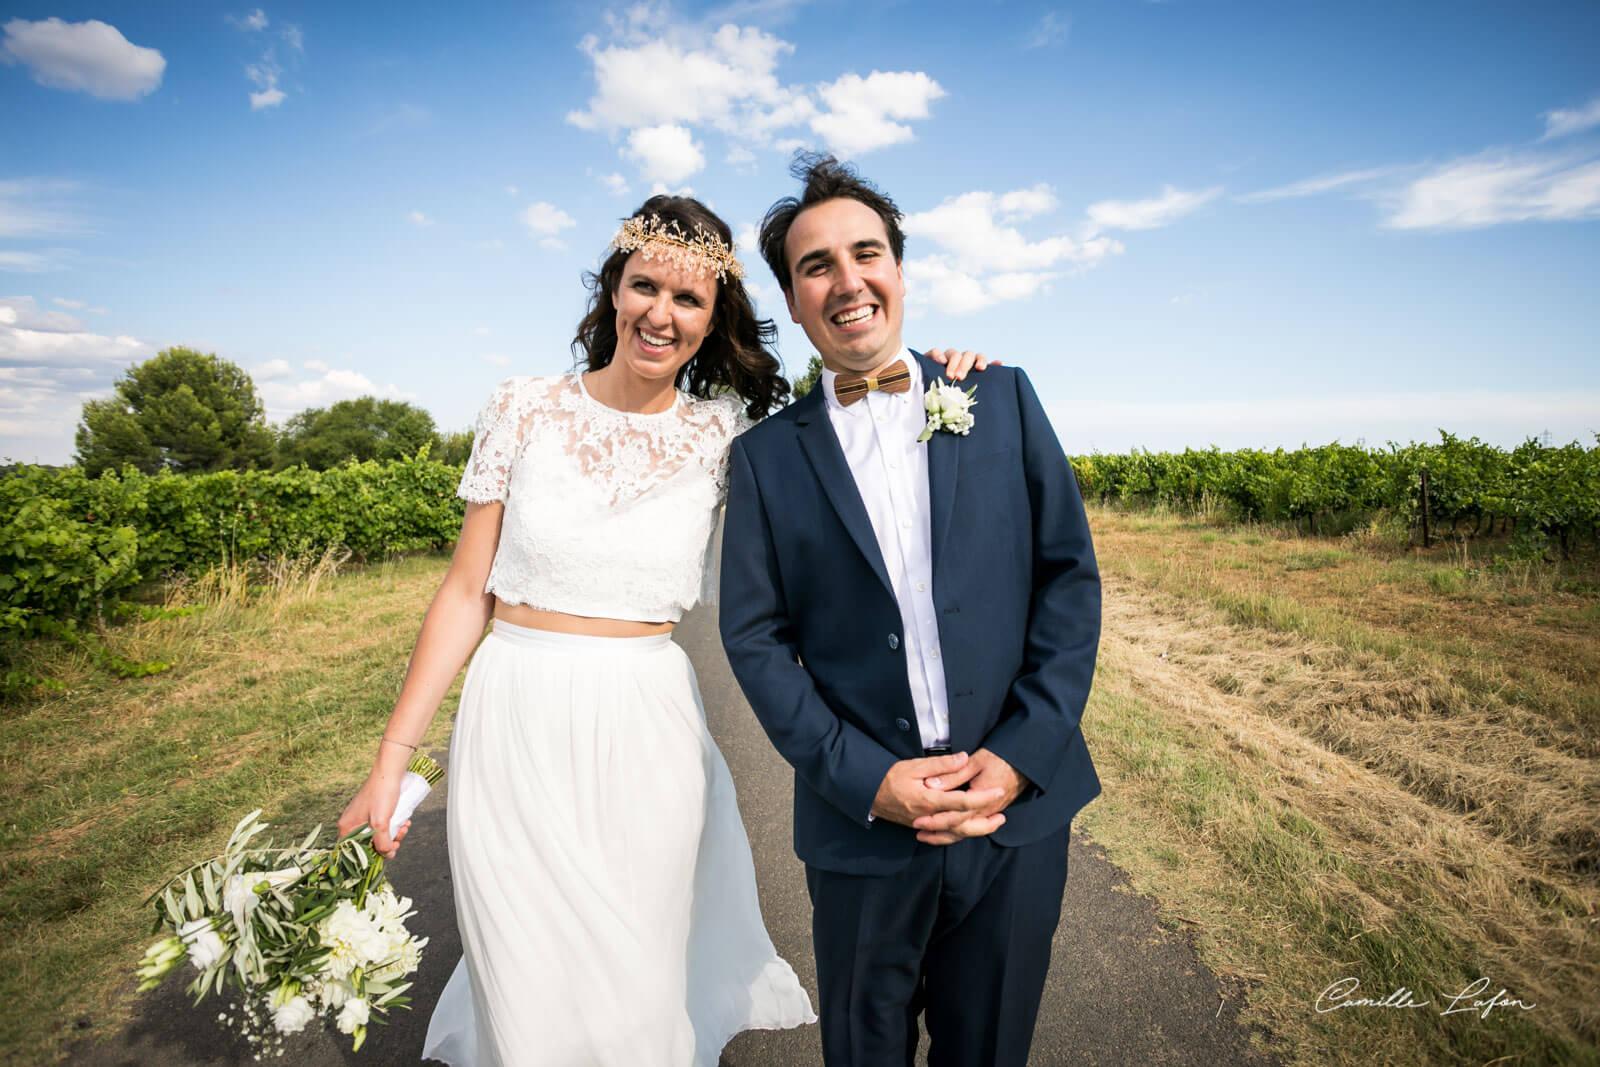 mariage chateau pouget photographe montpellier